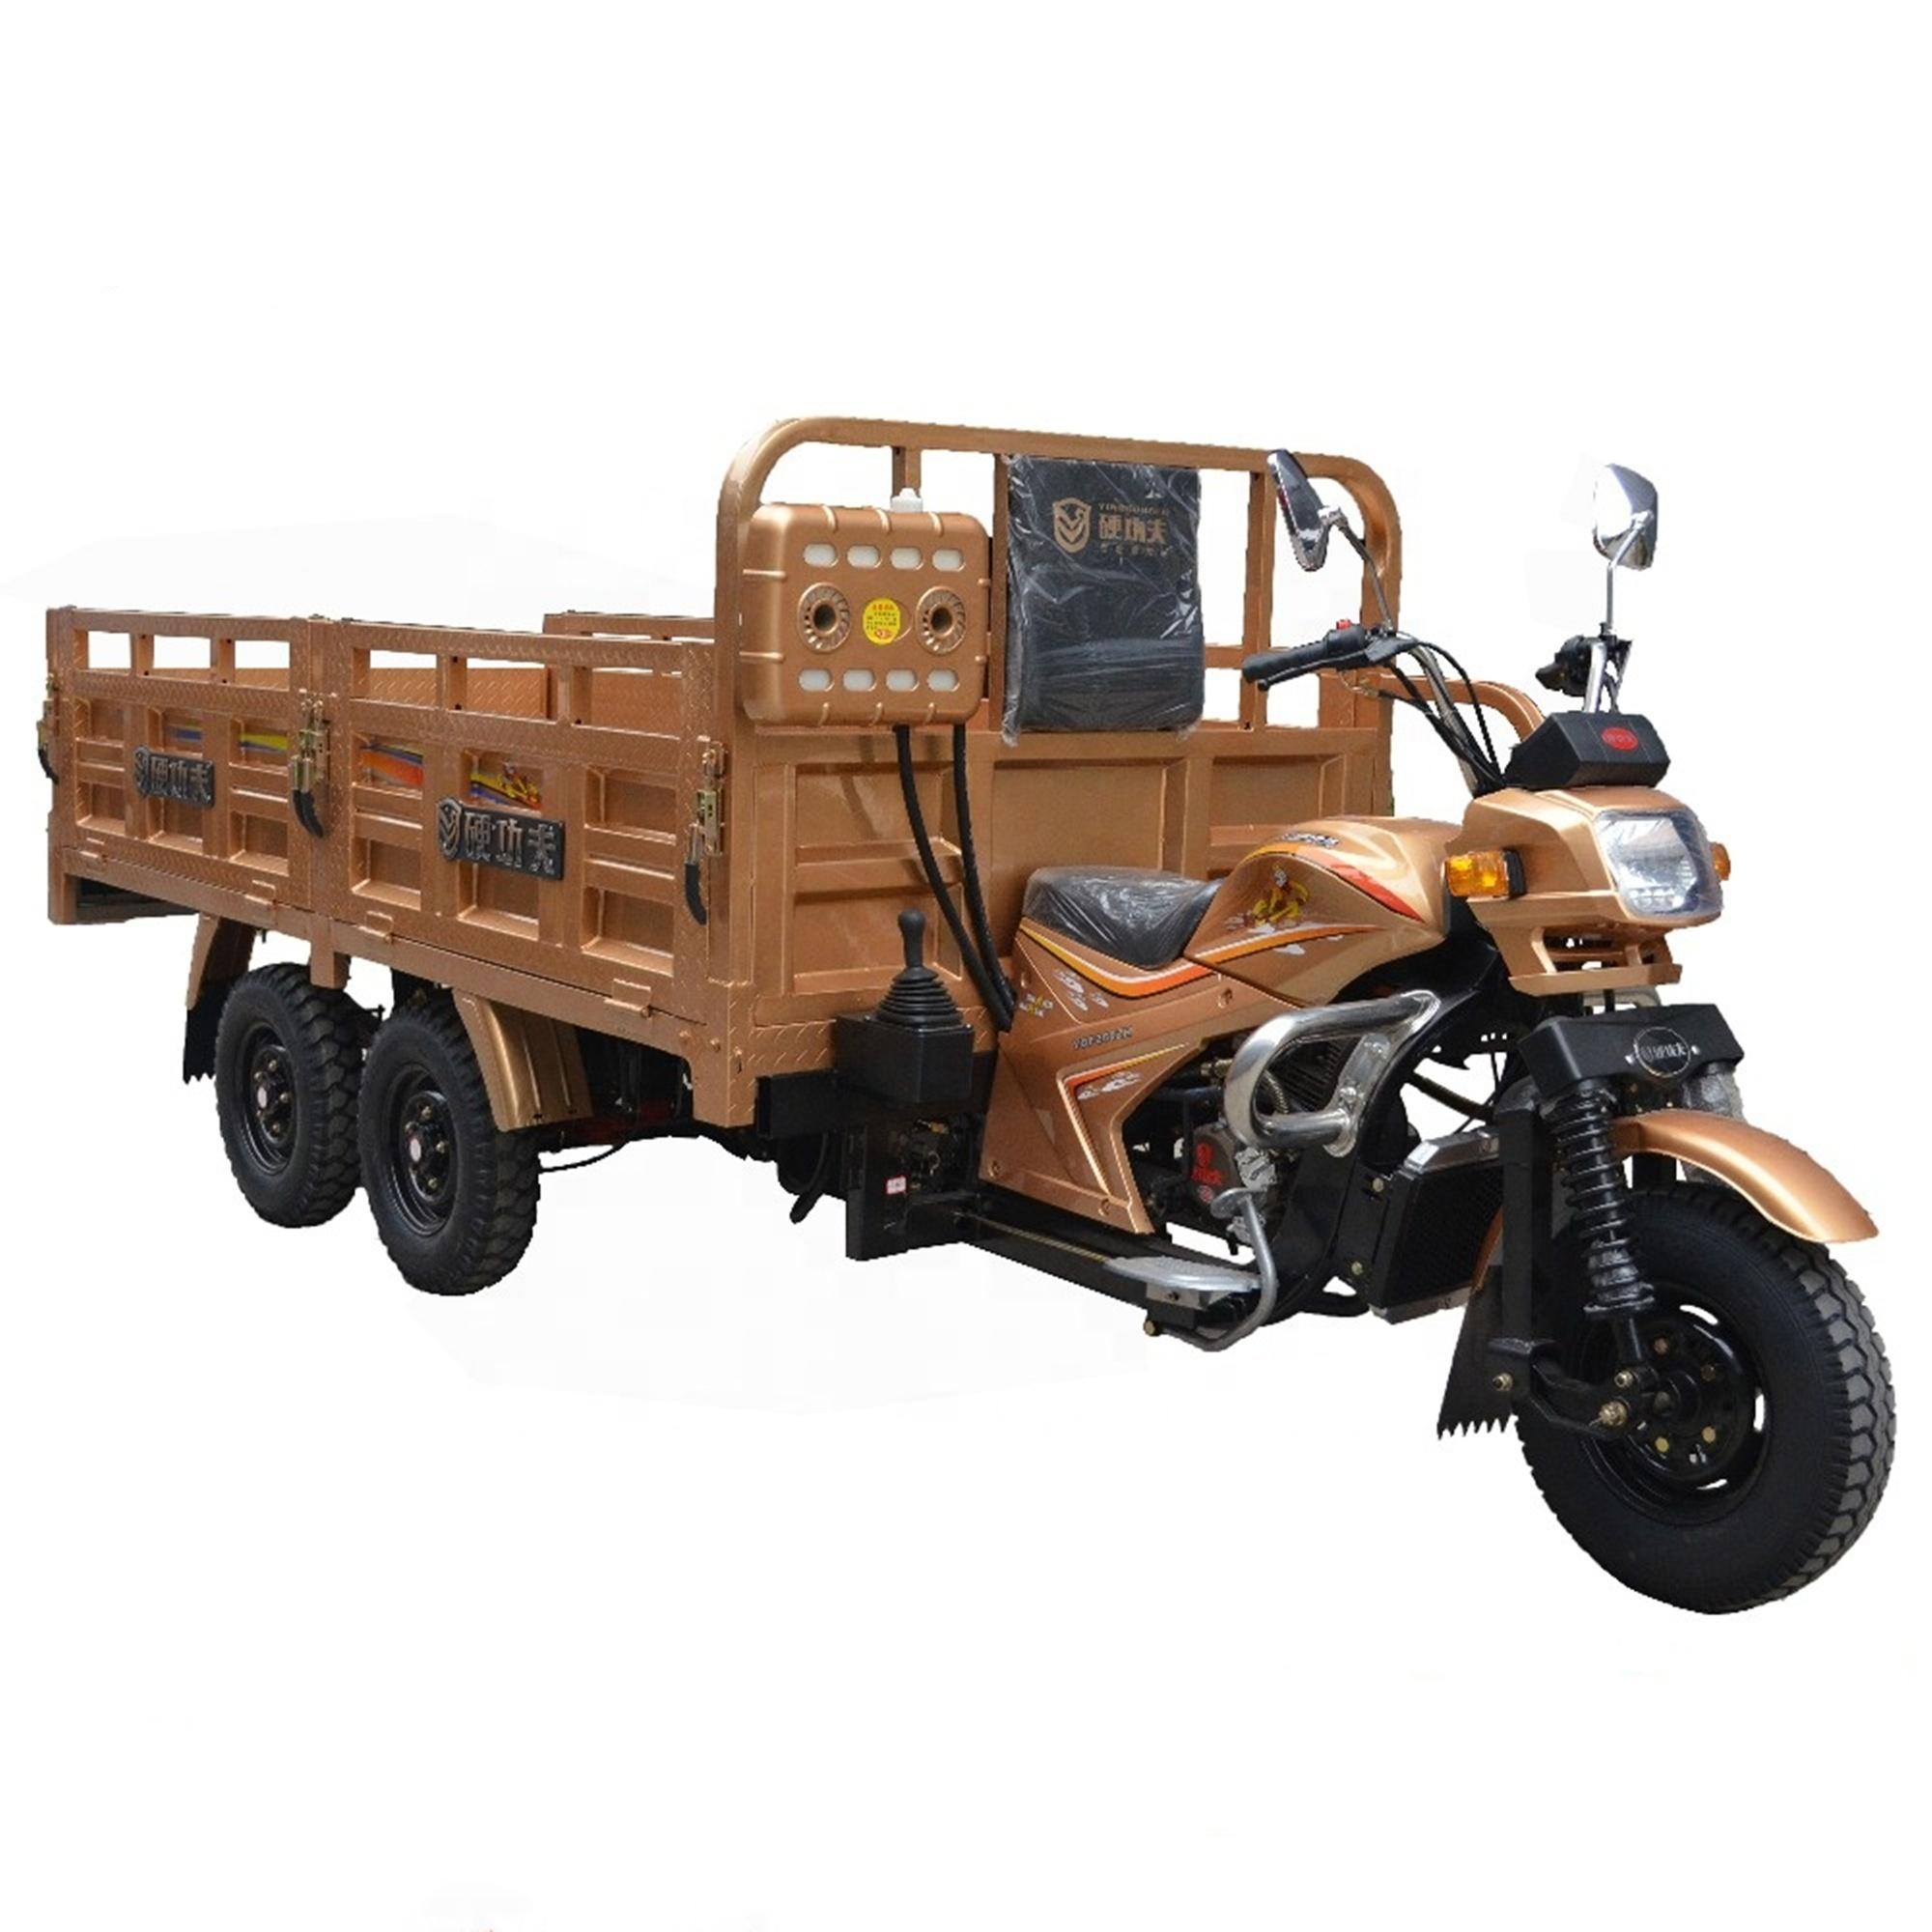 Dijual dengan Baik Truk Kargo Sepeda Roda Tiga/Lima Roda Lebih Panjang Sepeda Motor/Dobel Axle Roda Tiga OEM untuk Pelanggan